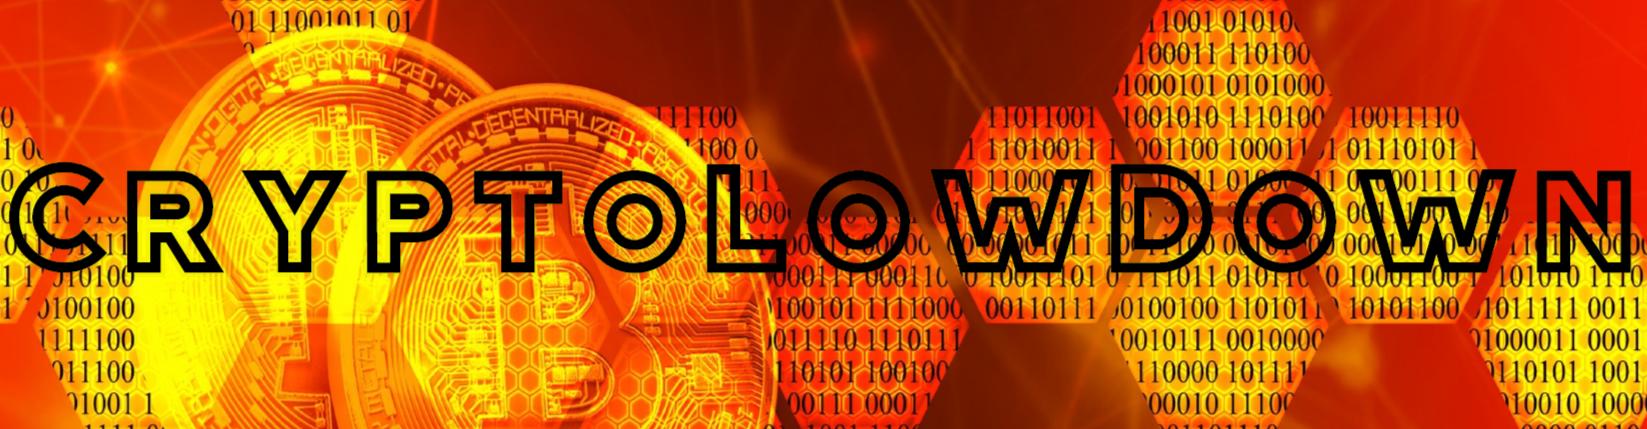 CryptoLowDown